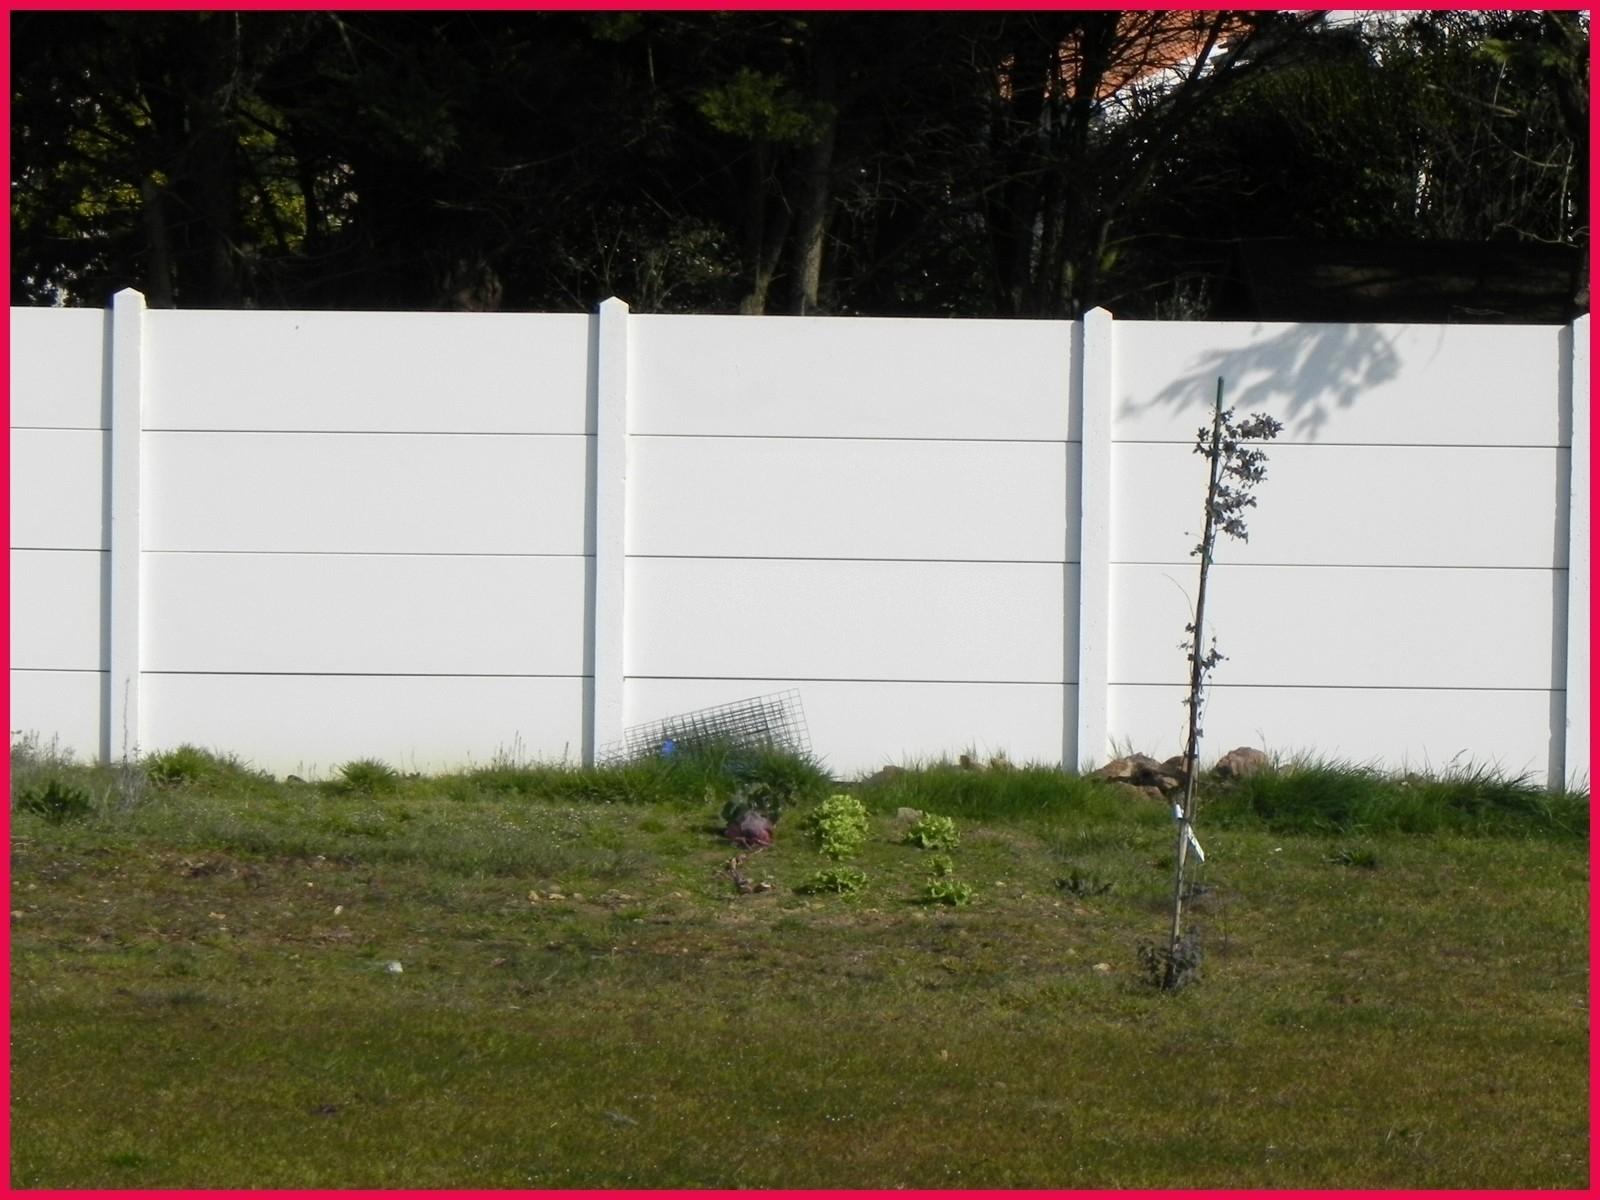 Barriere Jardin Castorama Beau Photos Palissade Jardin Pas Cher Cloture Jardin Luxe Cloture Jardin 0d Et